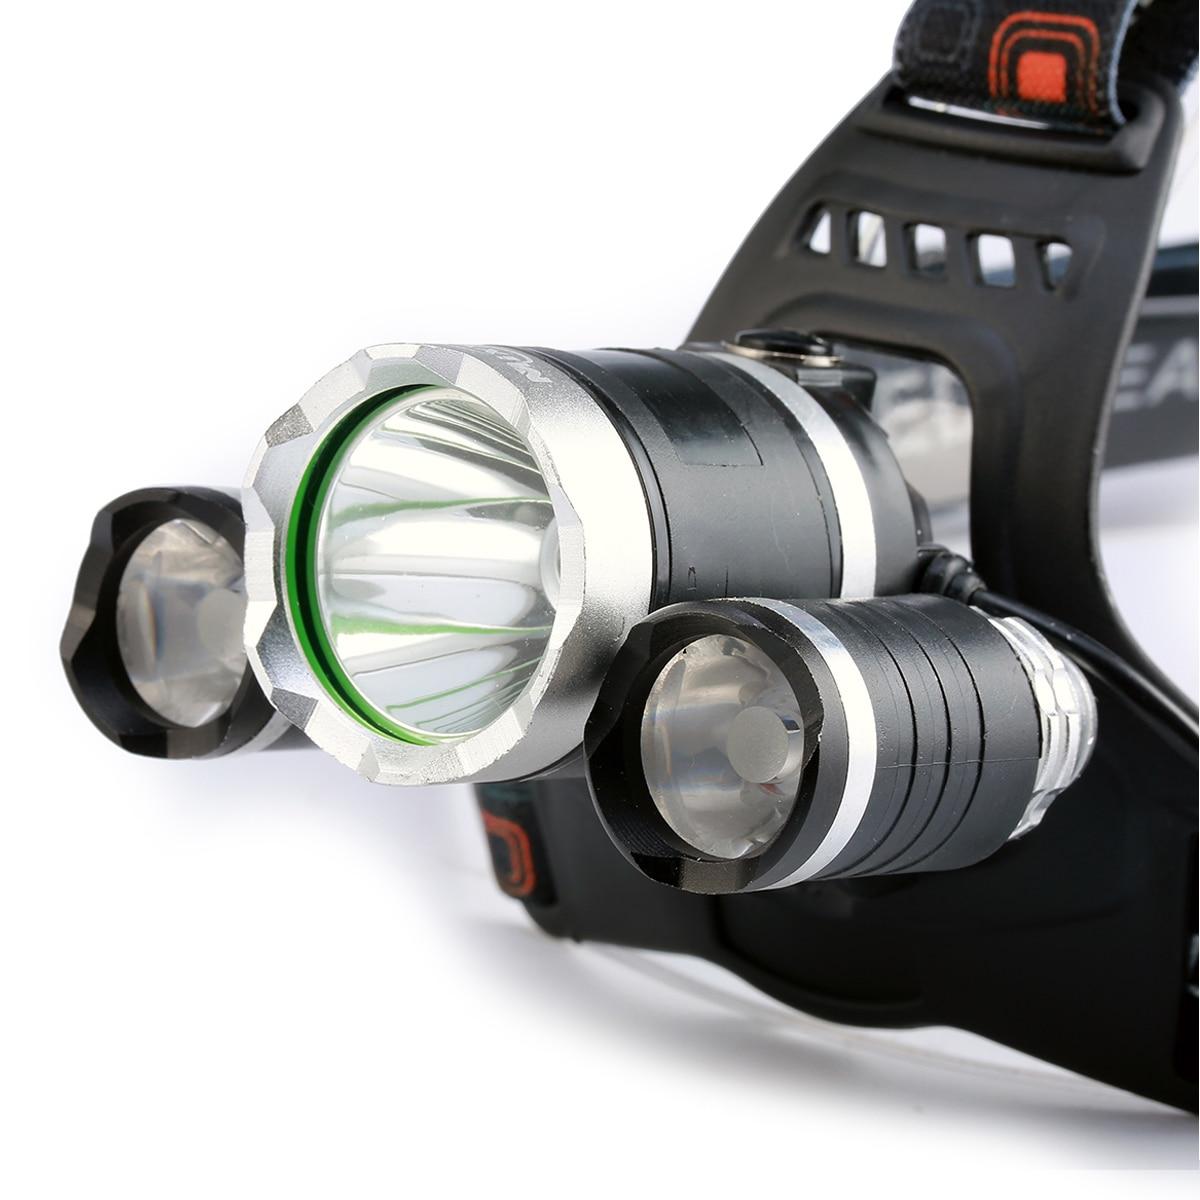 Faróis de Led lanterna tocha farol 18650 carregador Proposito : Camping, climbing, hunting, night Fishing, night Walk/ride